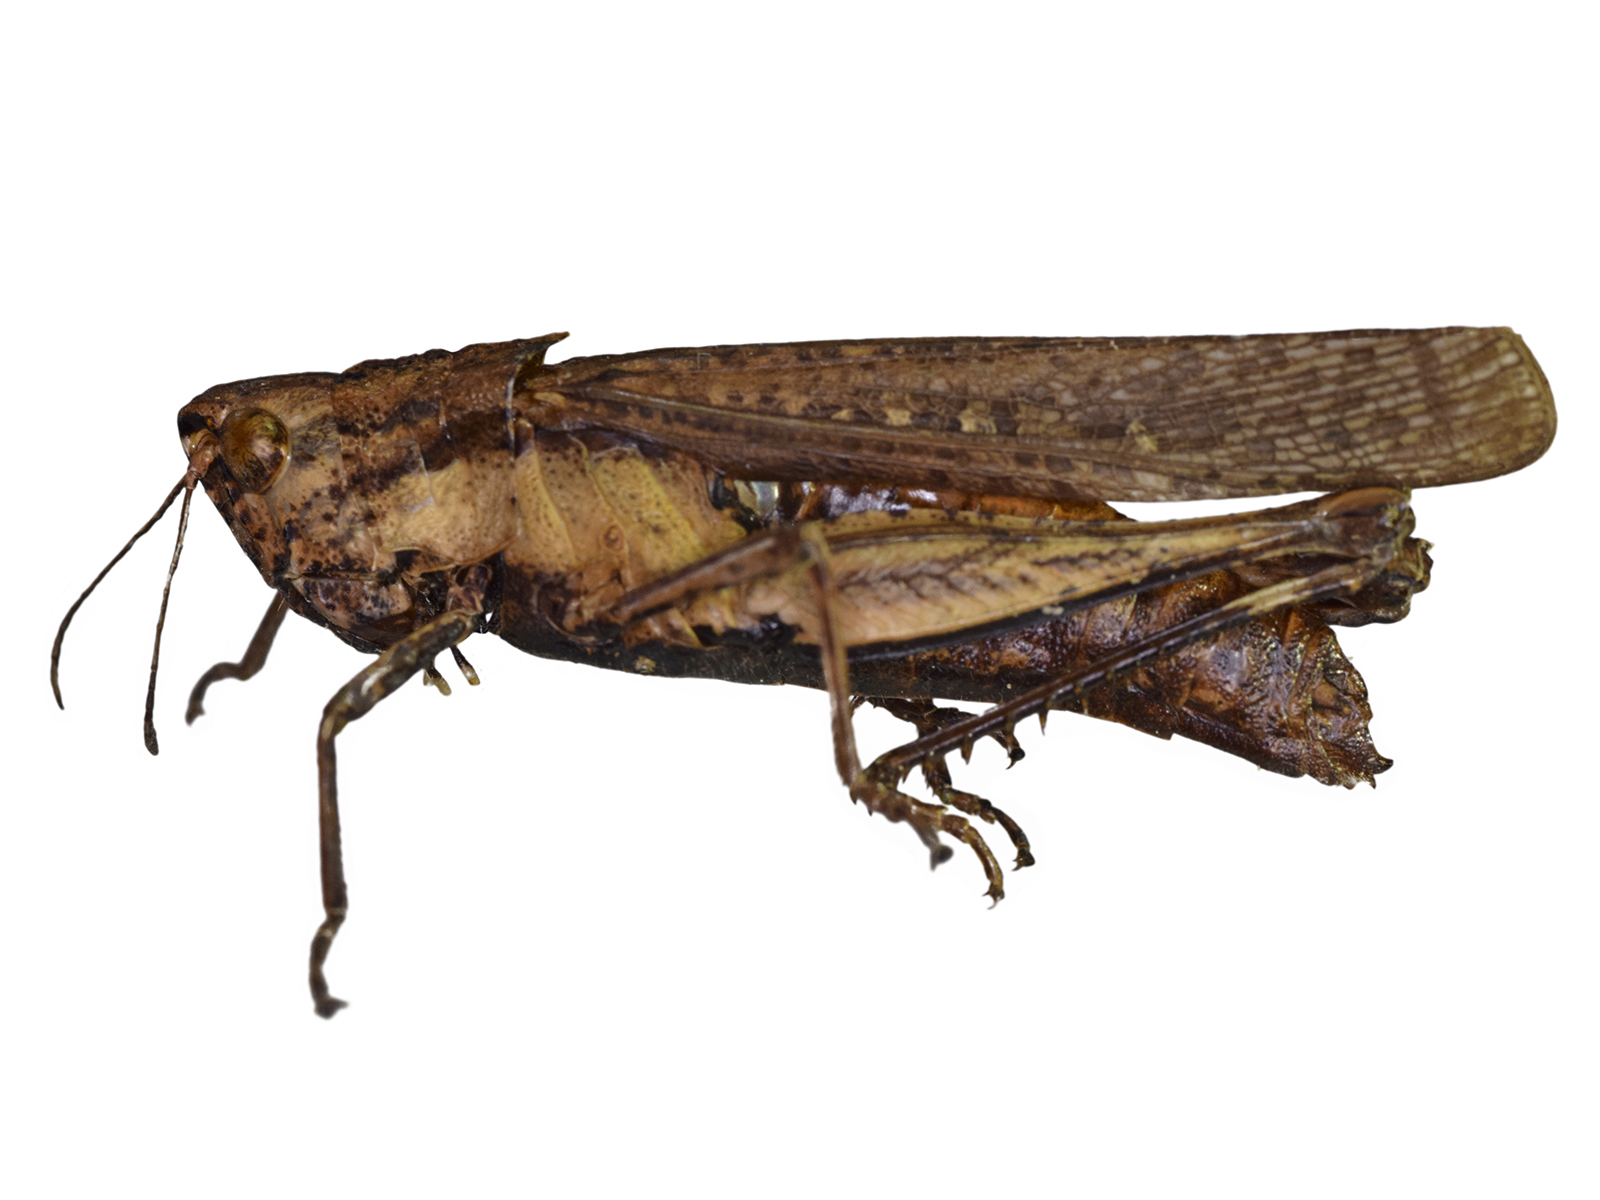 Peruvia nigromarginata (Scudder, 1875)